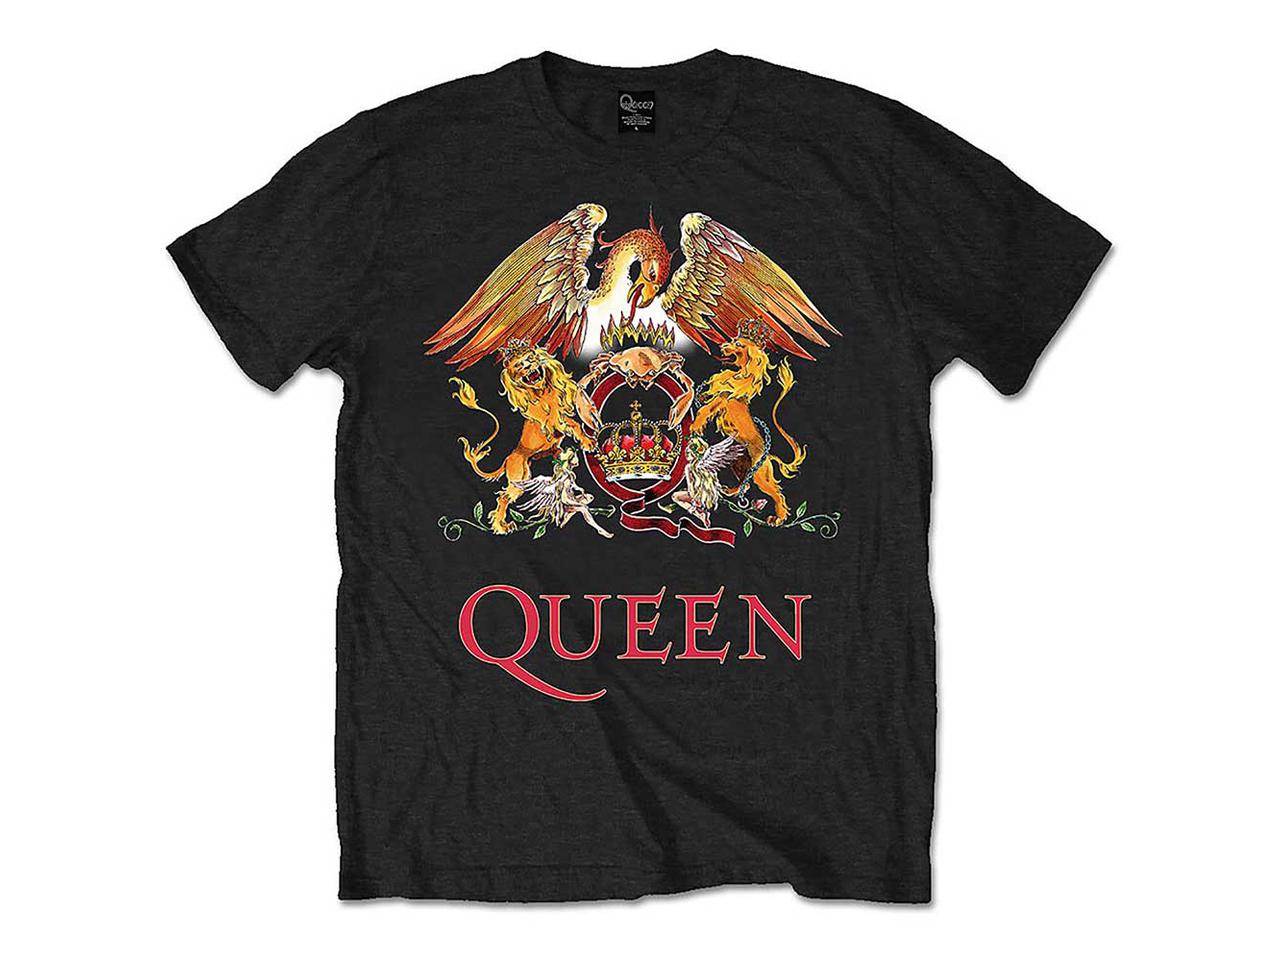 Queen Crest Iconic Band T-Shirt Merch Music Rock Logo Classic British